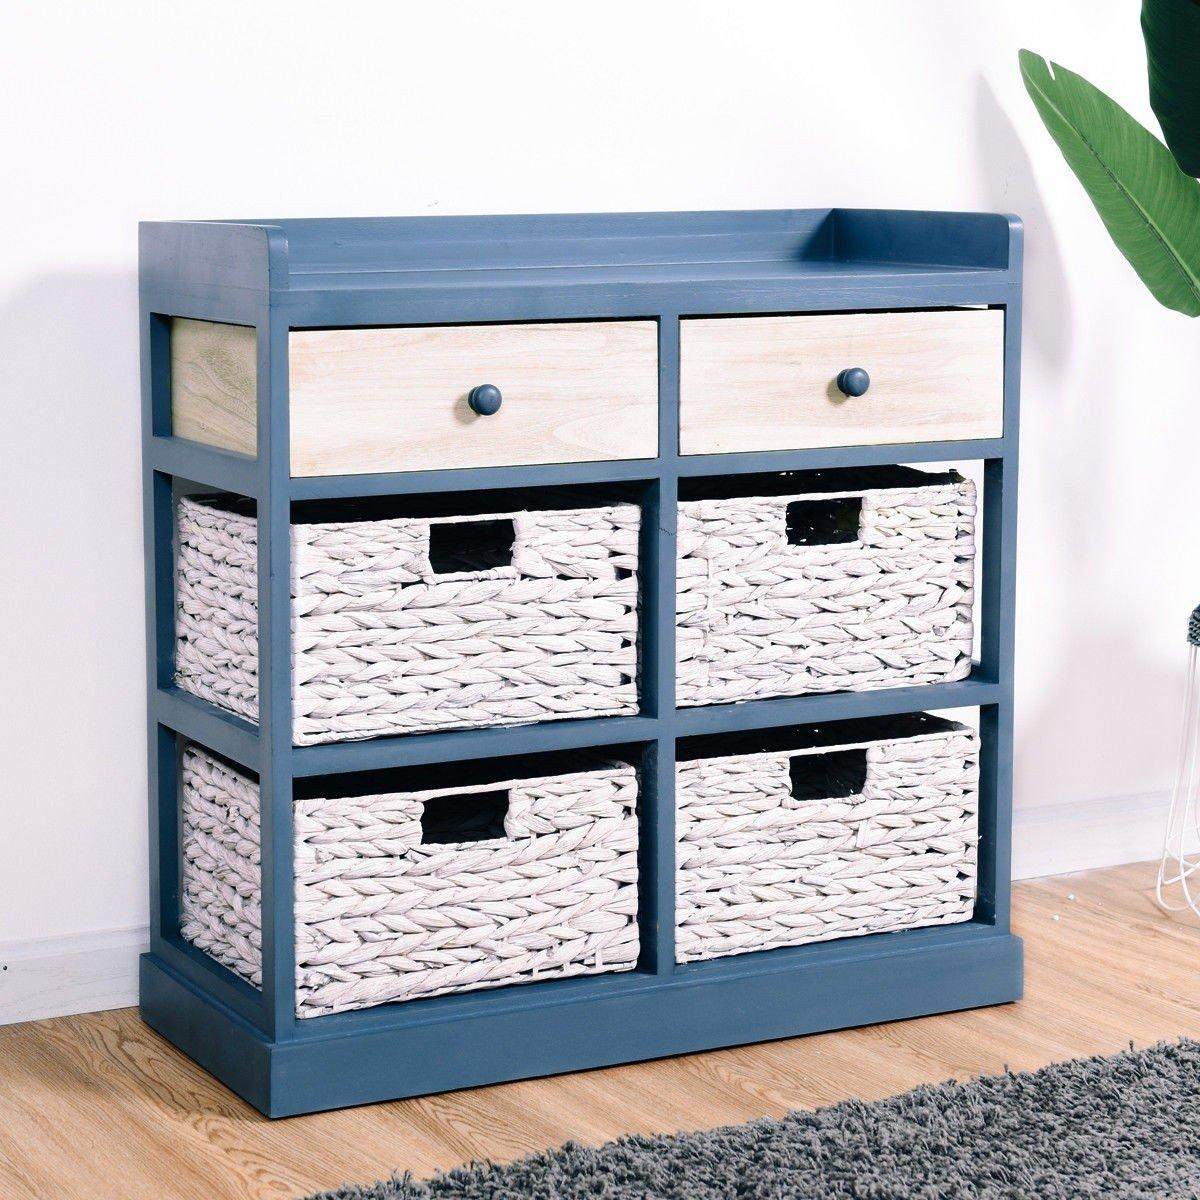 BESTChoiceForYou Cabinet Table Storage Side Wood Drawers Console Sideboard Cupboard W Furniture End Vidaxl White Baskets Drawer Door Home by BESTChoiceForYou (Image #2)